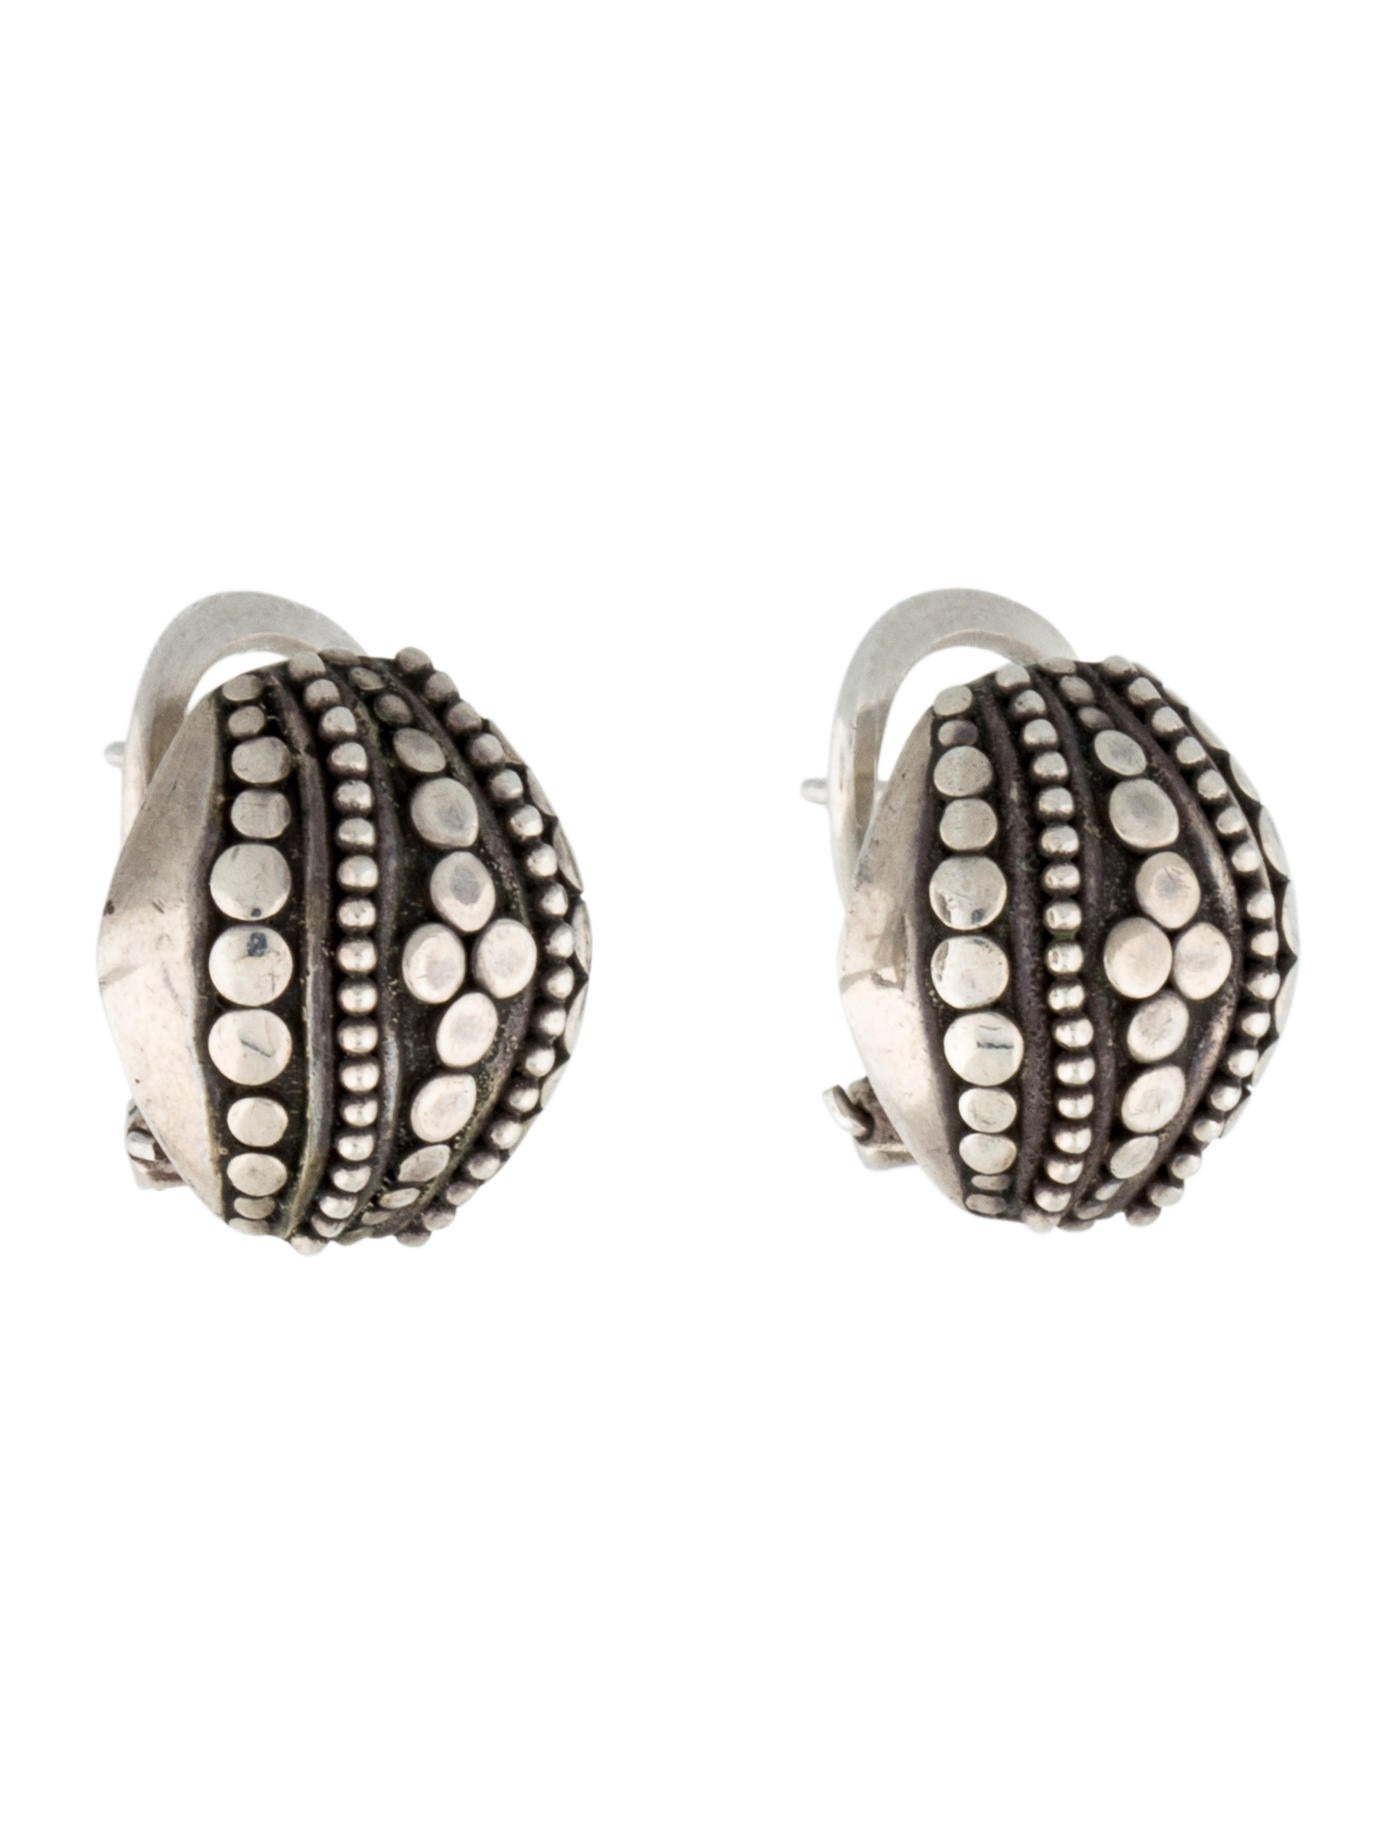 John hardy dot earrings jewelry jha23215 the realreal for John hardy jewelry earrings